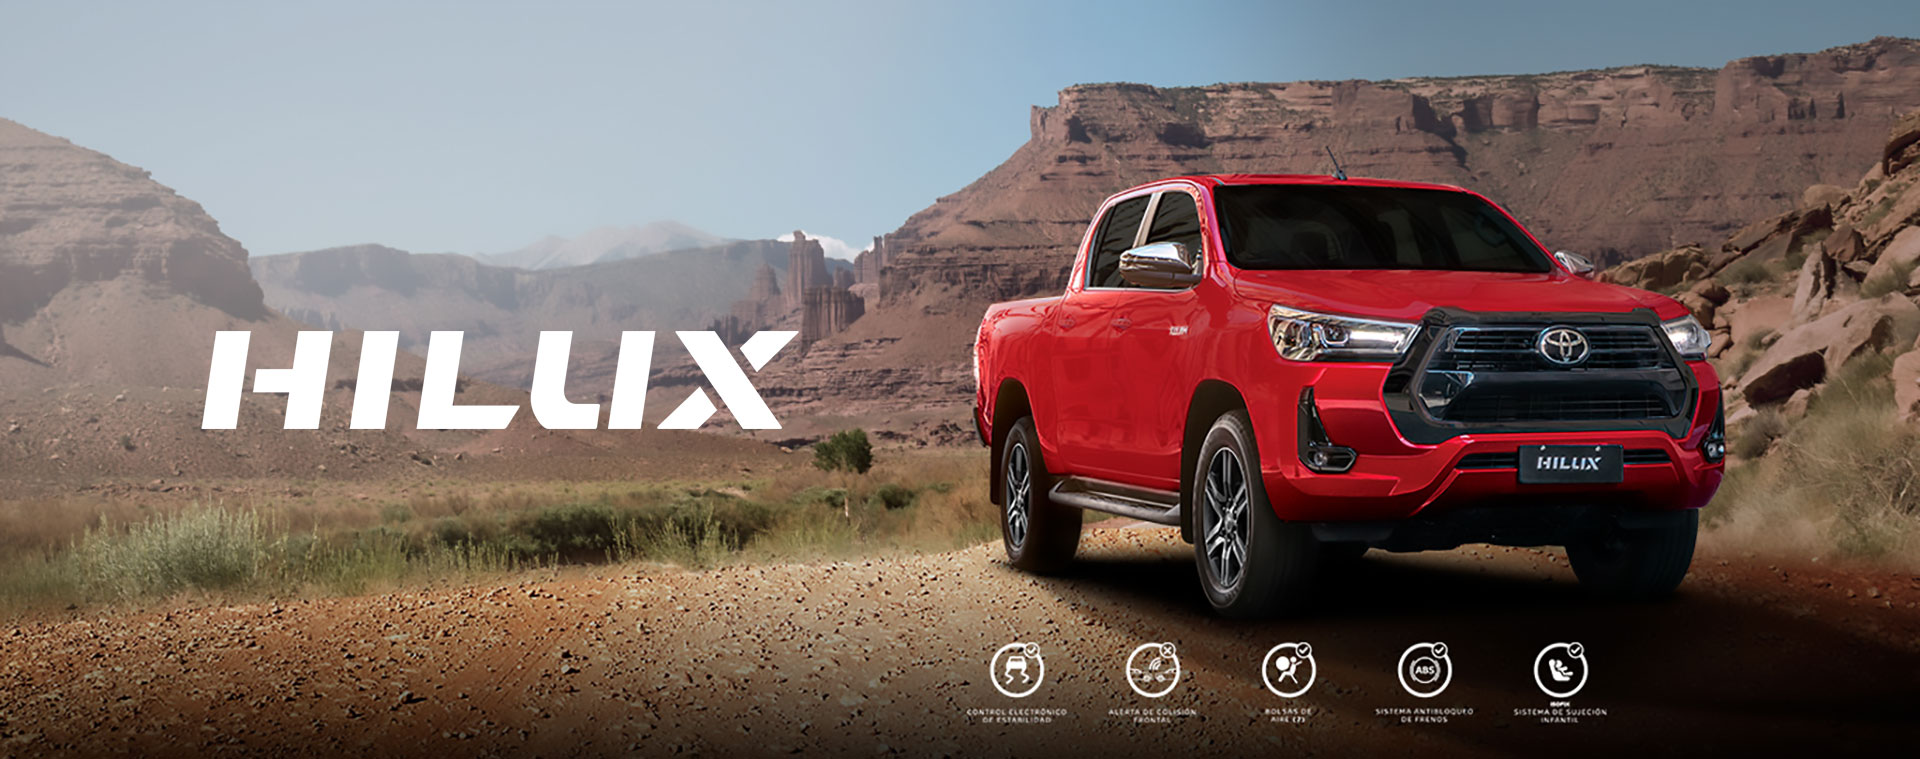 Image toyota hilux Toyota HILUX HILUX 2